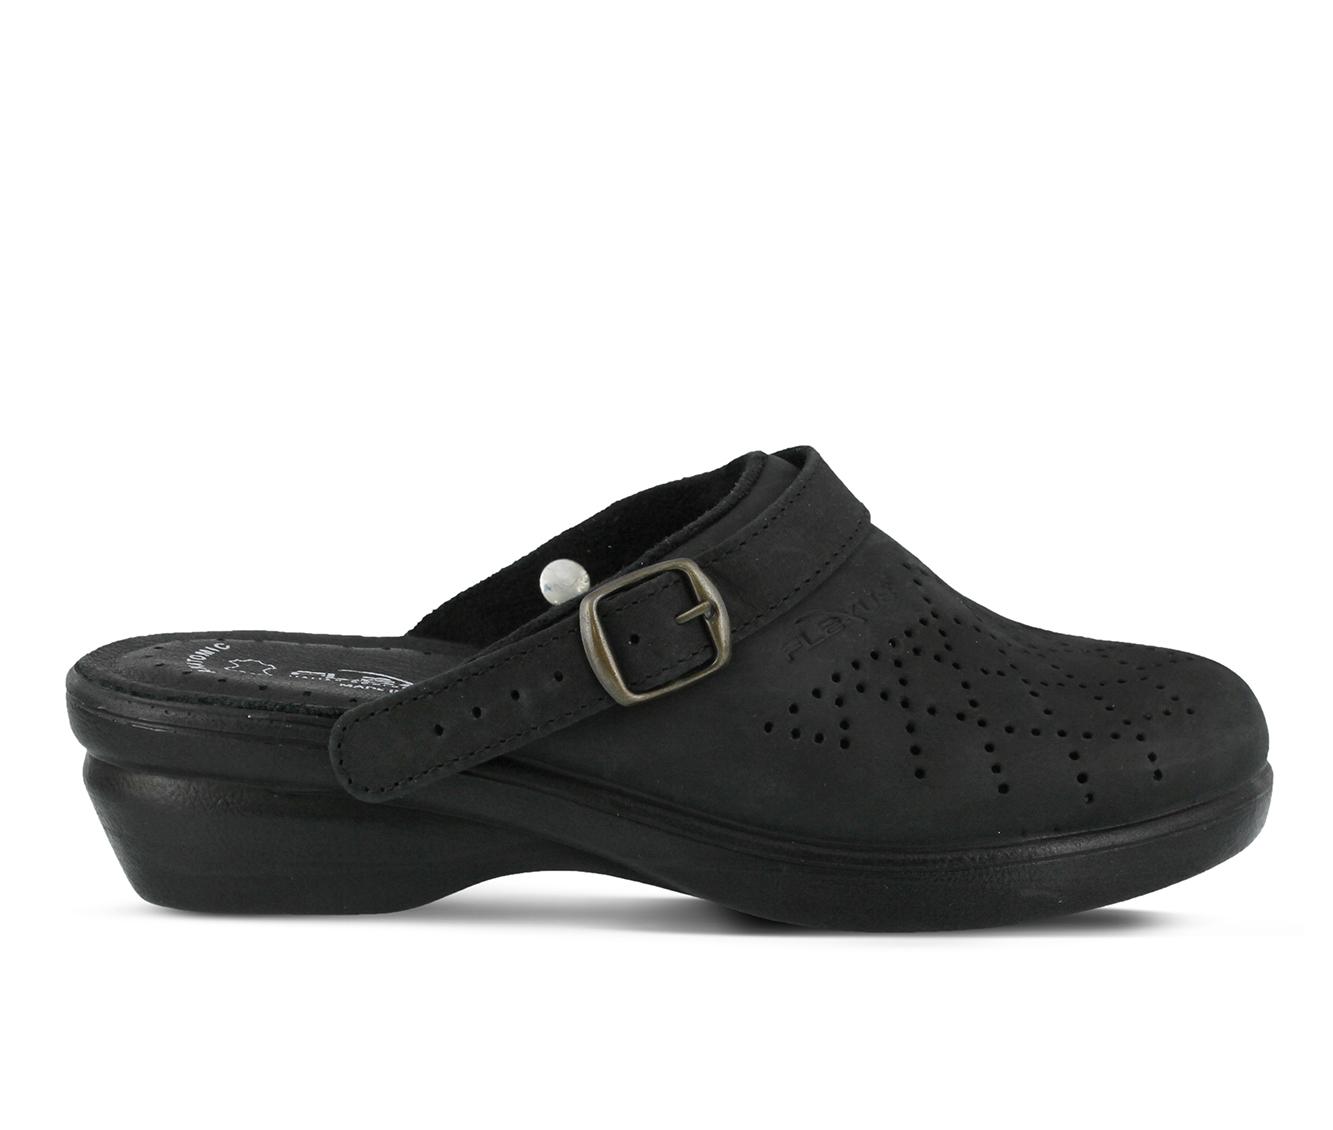 Flexus Pride Women's Shoe (Black Faux Leather)